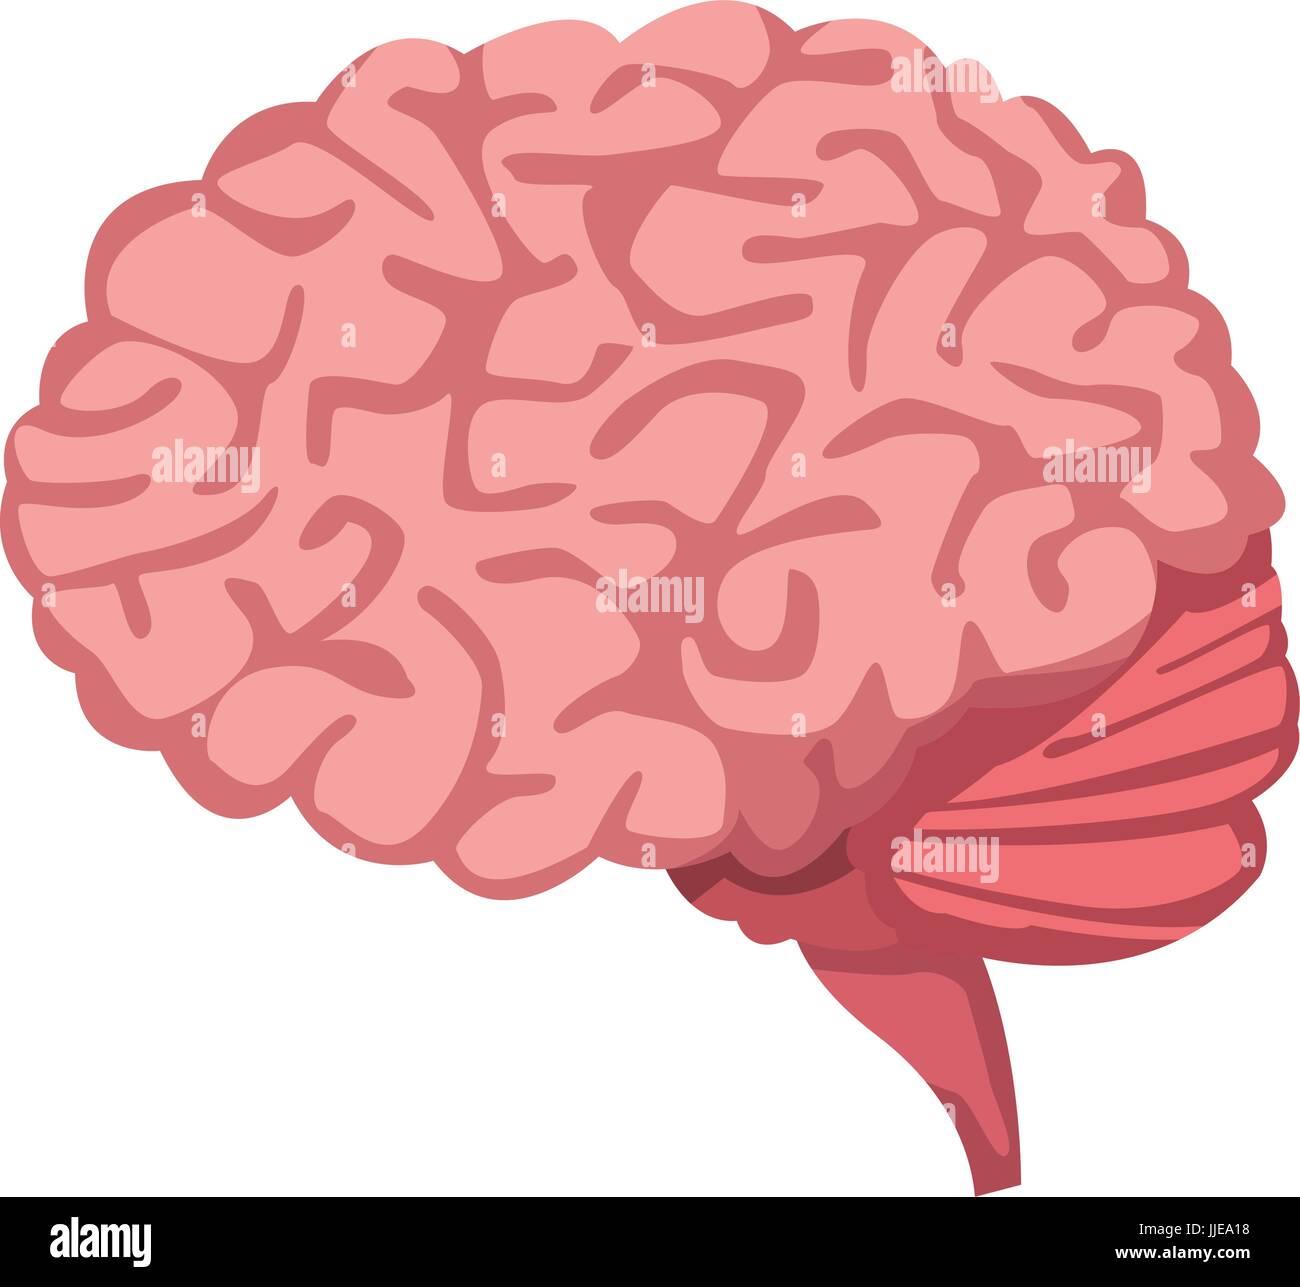 Human Brain For Medical Healthy Memory Anatomy Design Stock Vector